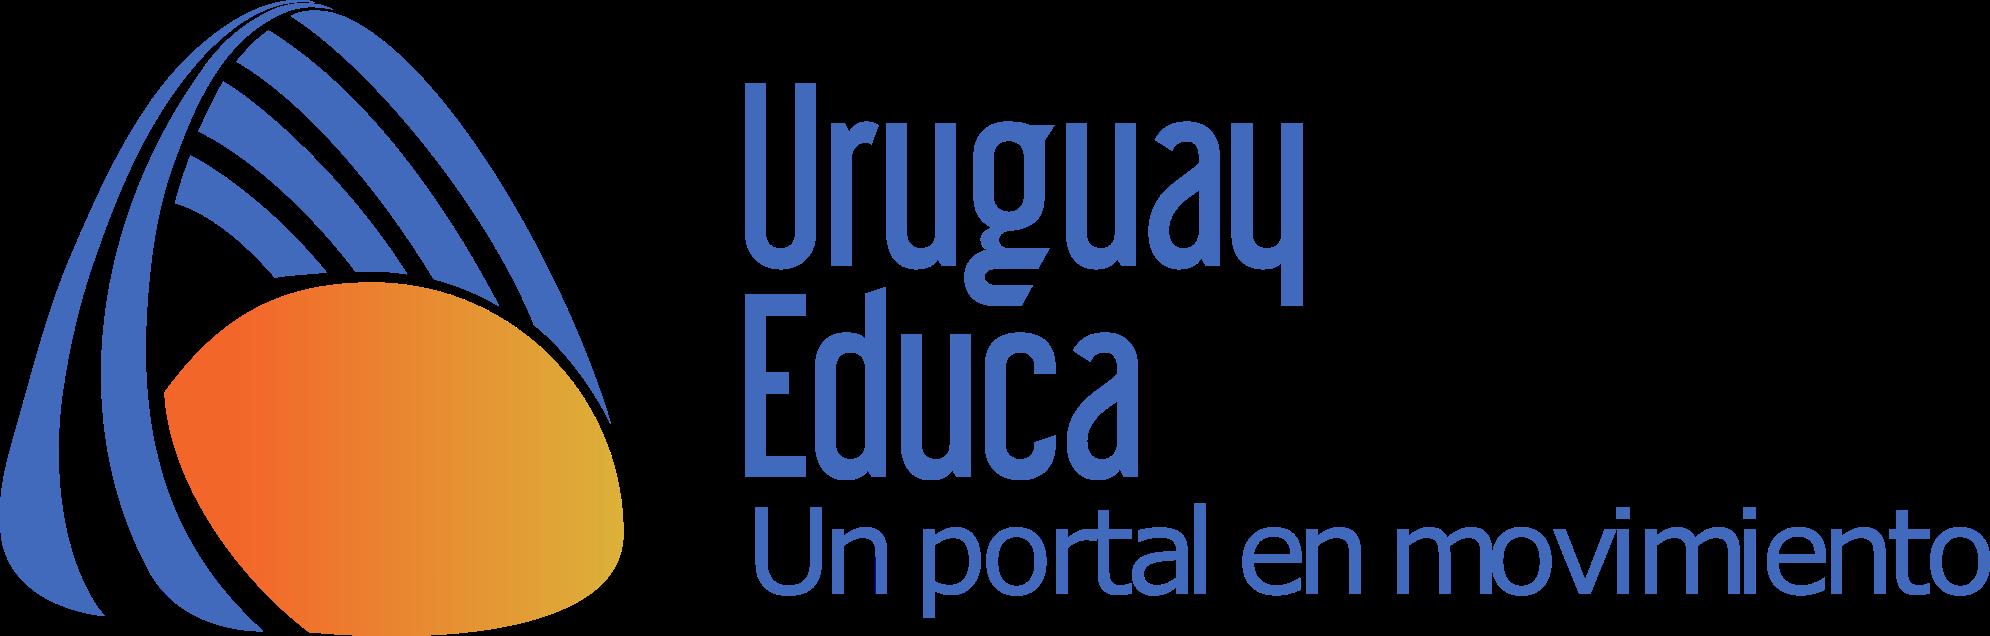 Logo portal Uruguay Educa